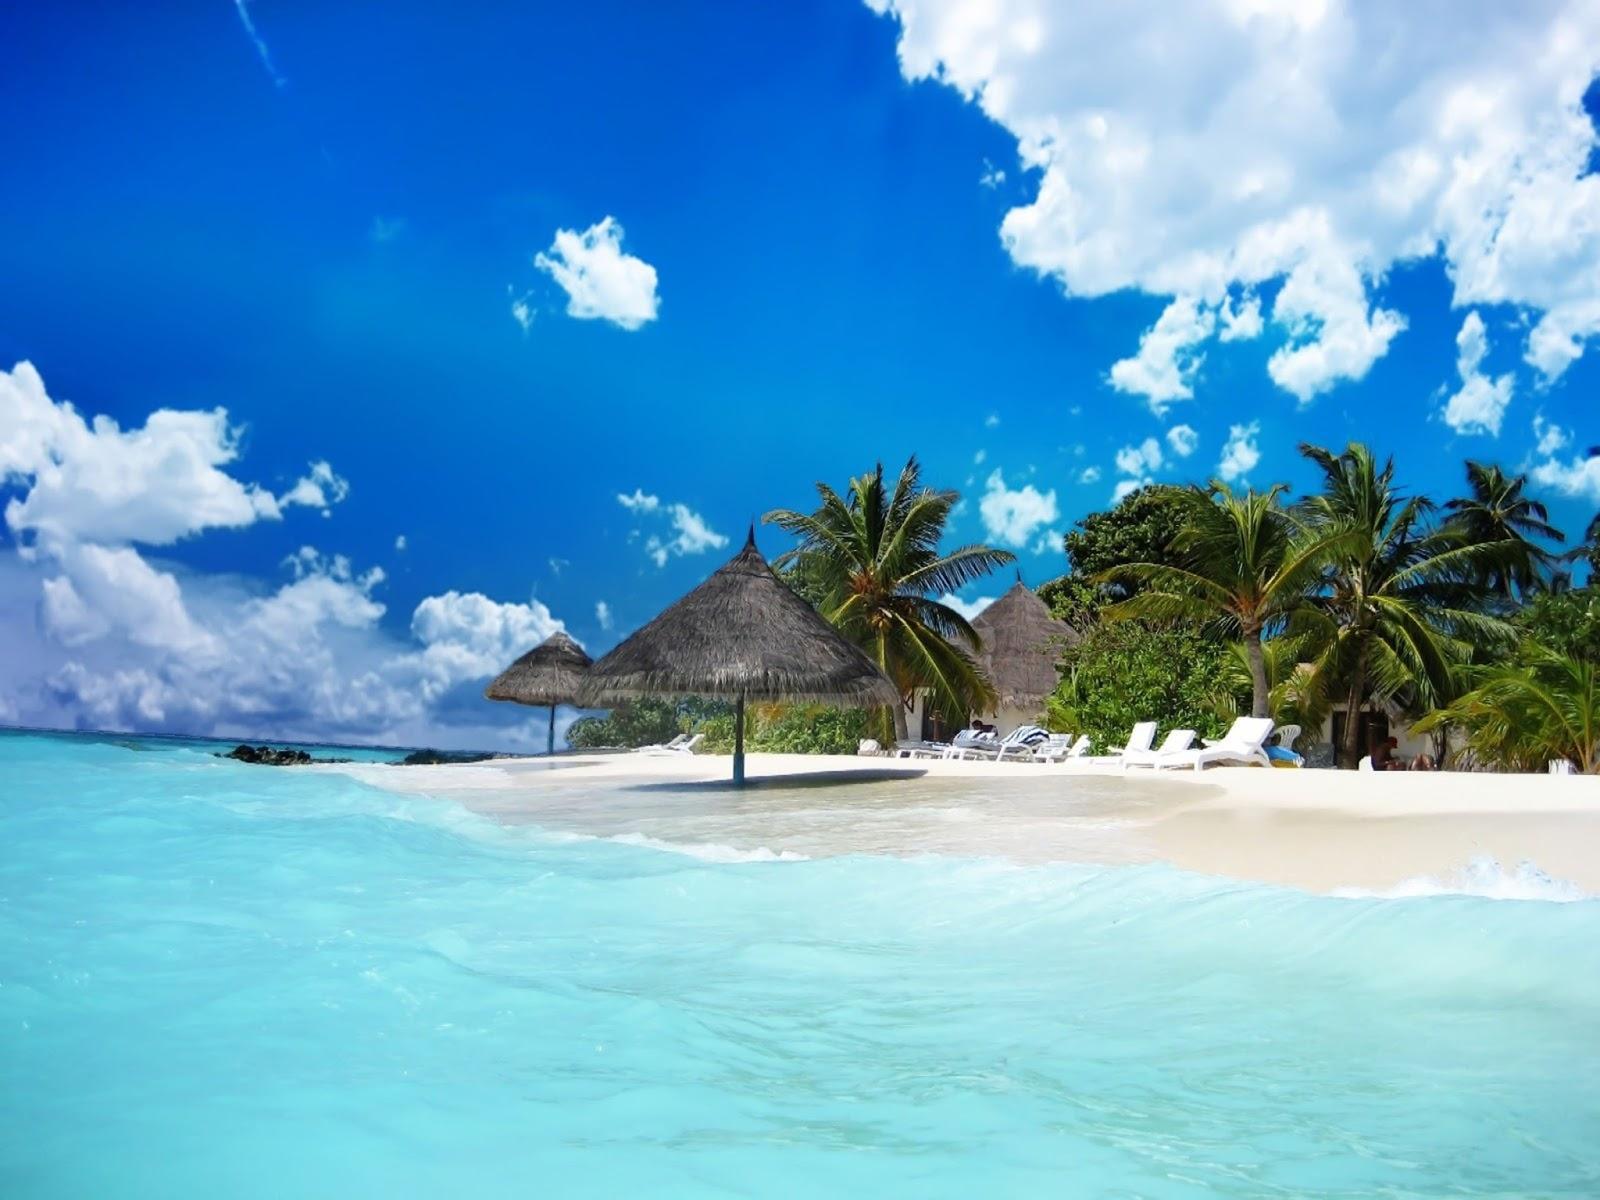 http://3.bp.blogspot.com/-VWh61C6muiM/USObstVrUkI/AAAAAAAAPqc/jtDGXFGiJ40/s1600/white+beach+blue+huts.jpg